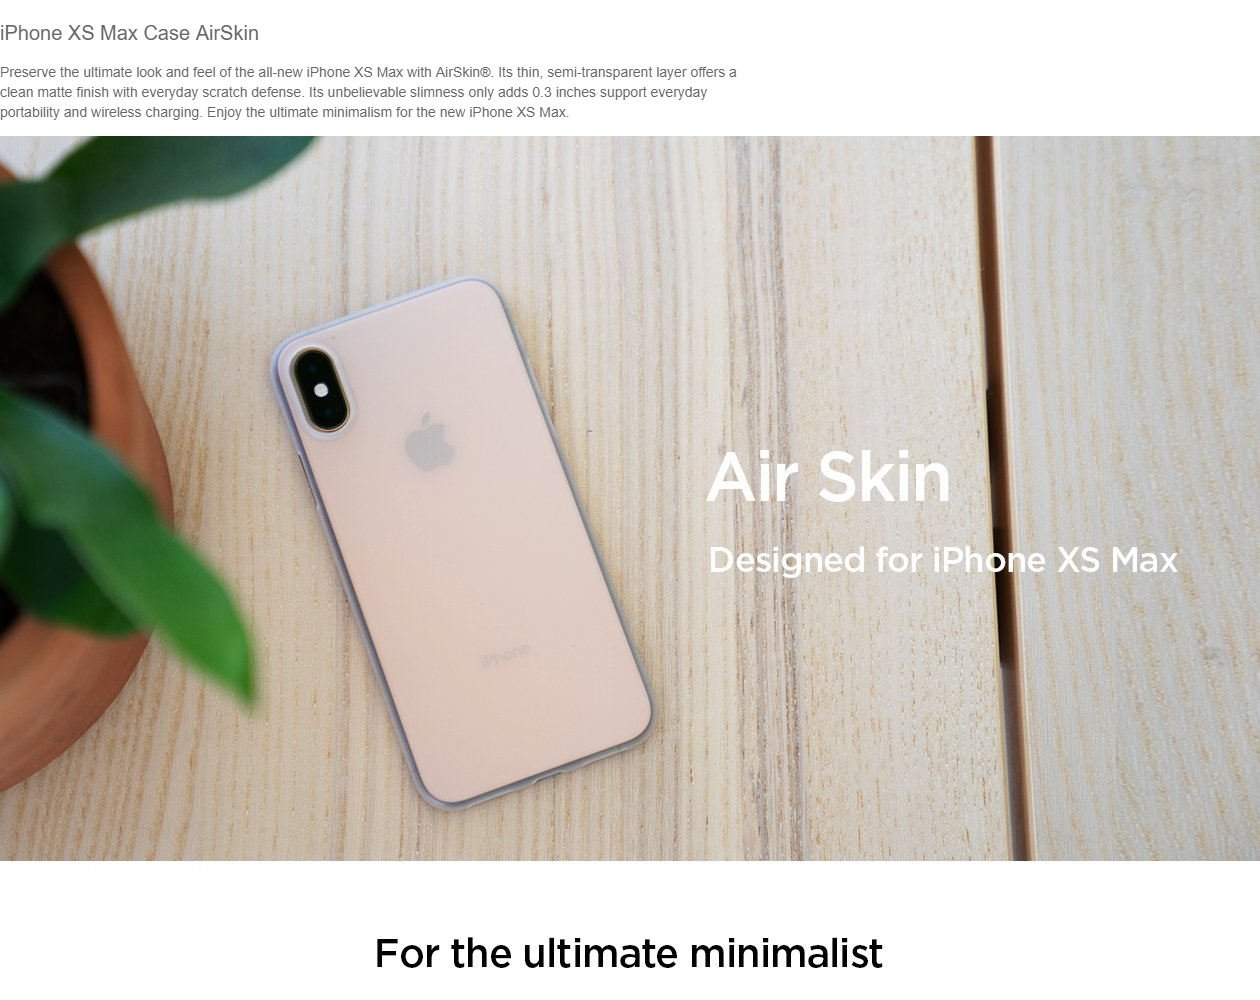 timeless design 71337 c6fc3 Spigen iPhone XS Max 6.5 Air Skin Case (Authentic)